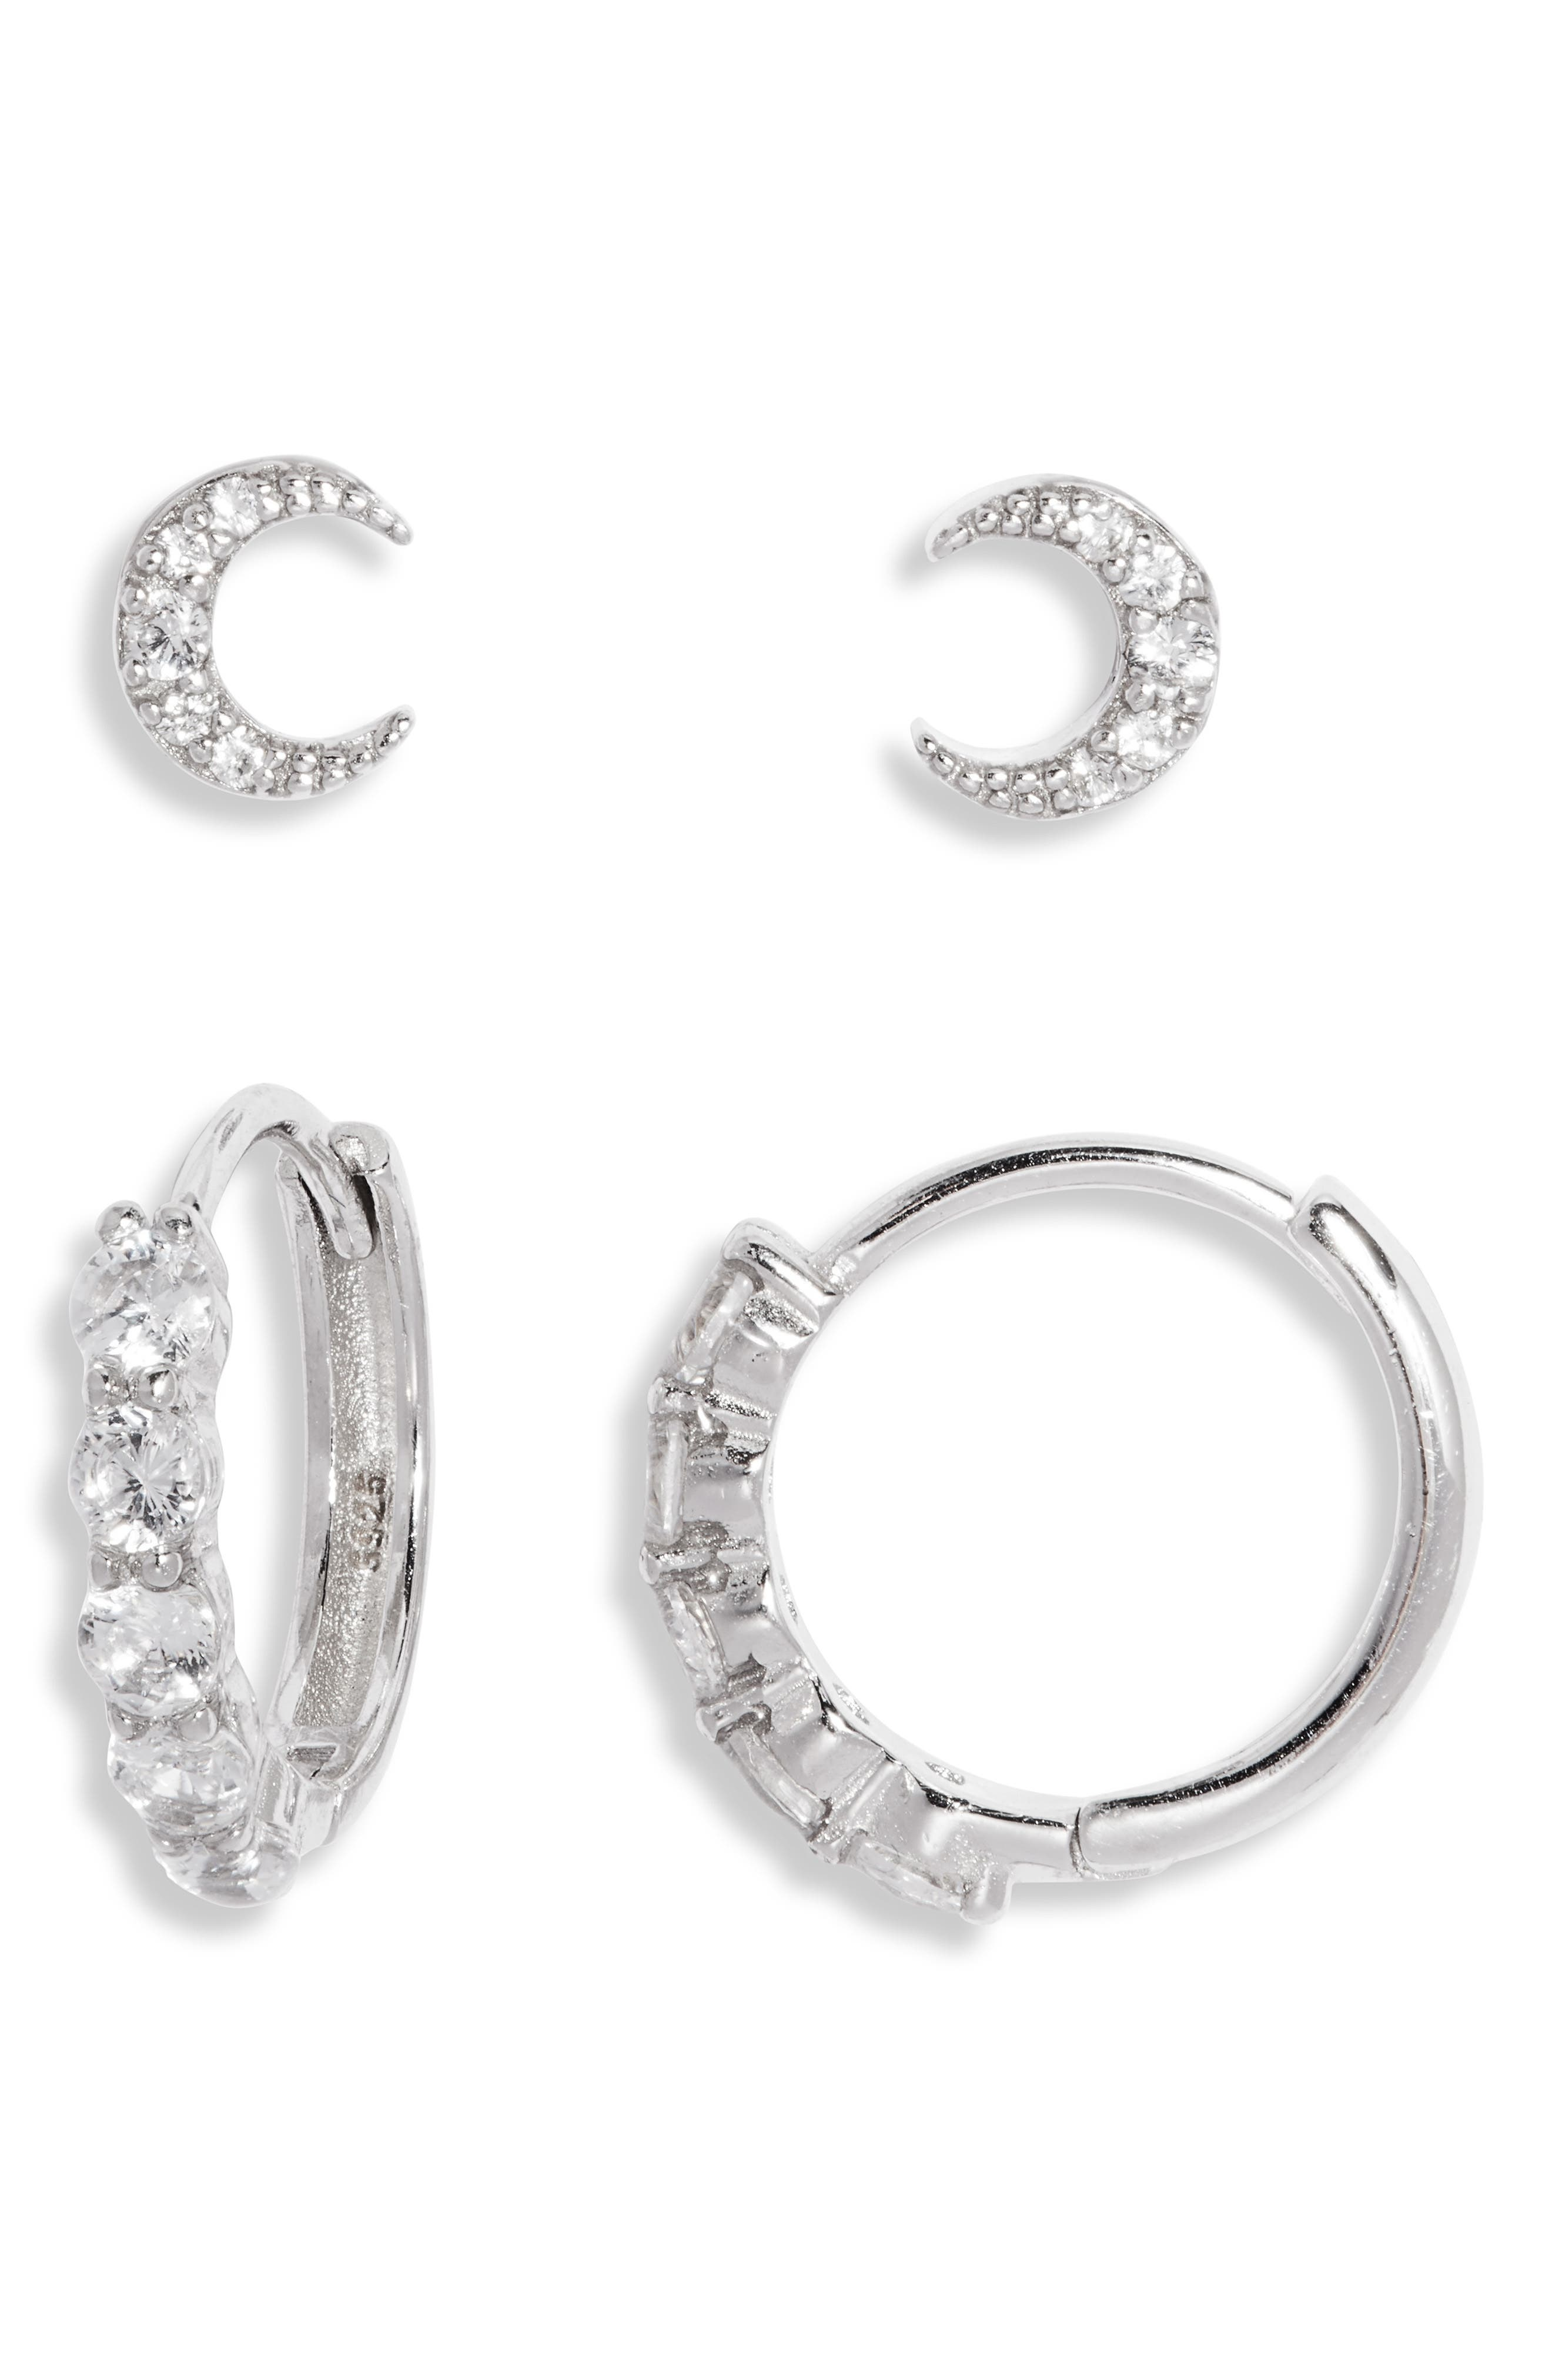 Tiny Moon Set Of 2 Earrings